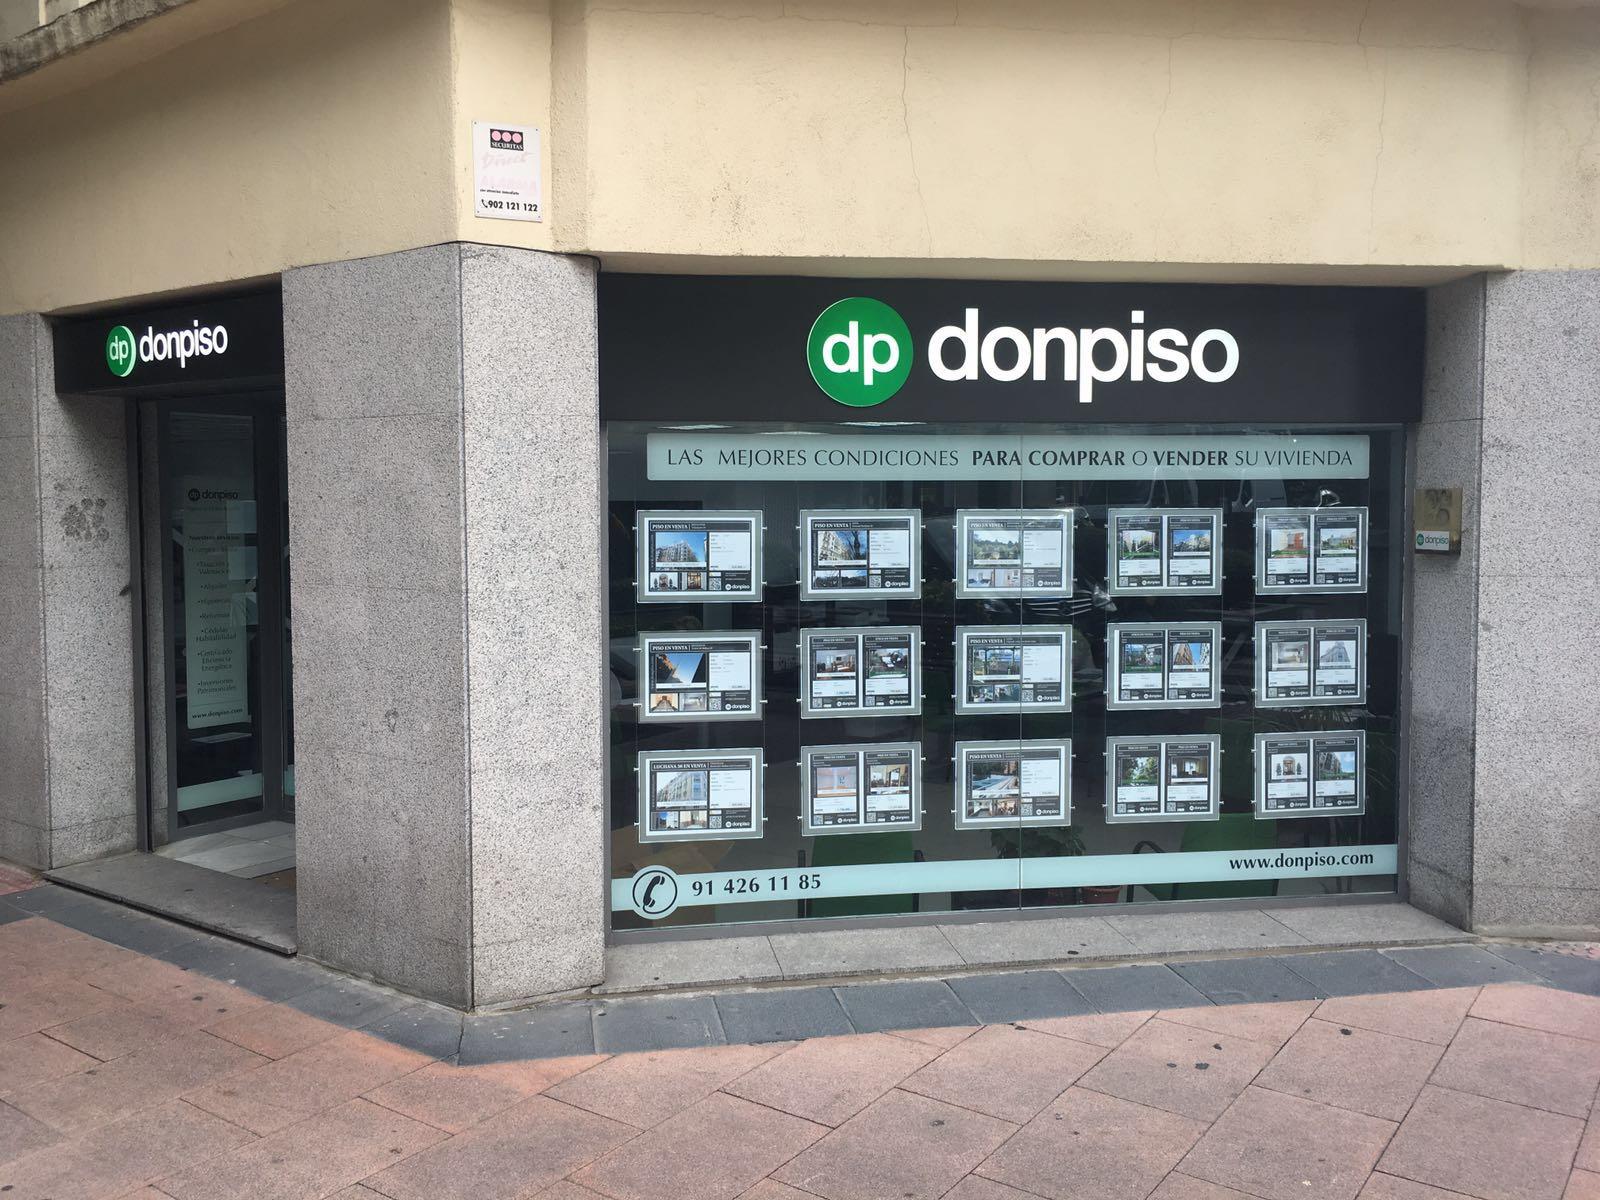 oficina donpiso Barrio de Salamanca